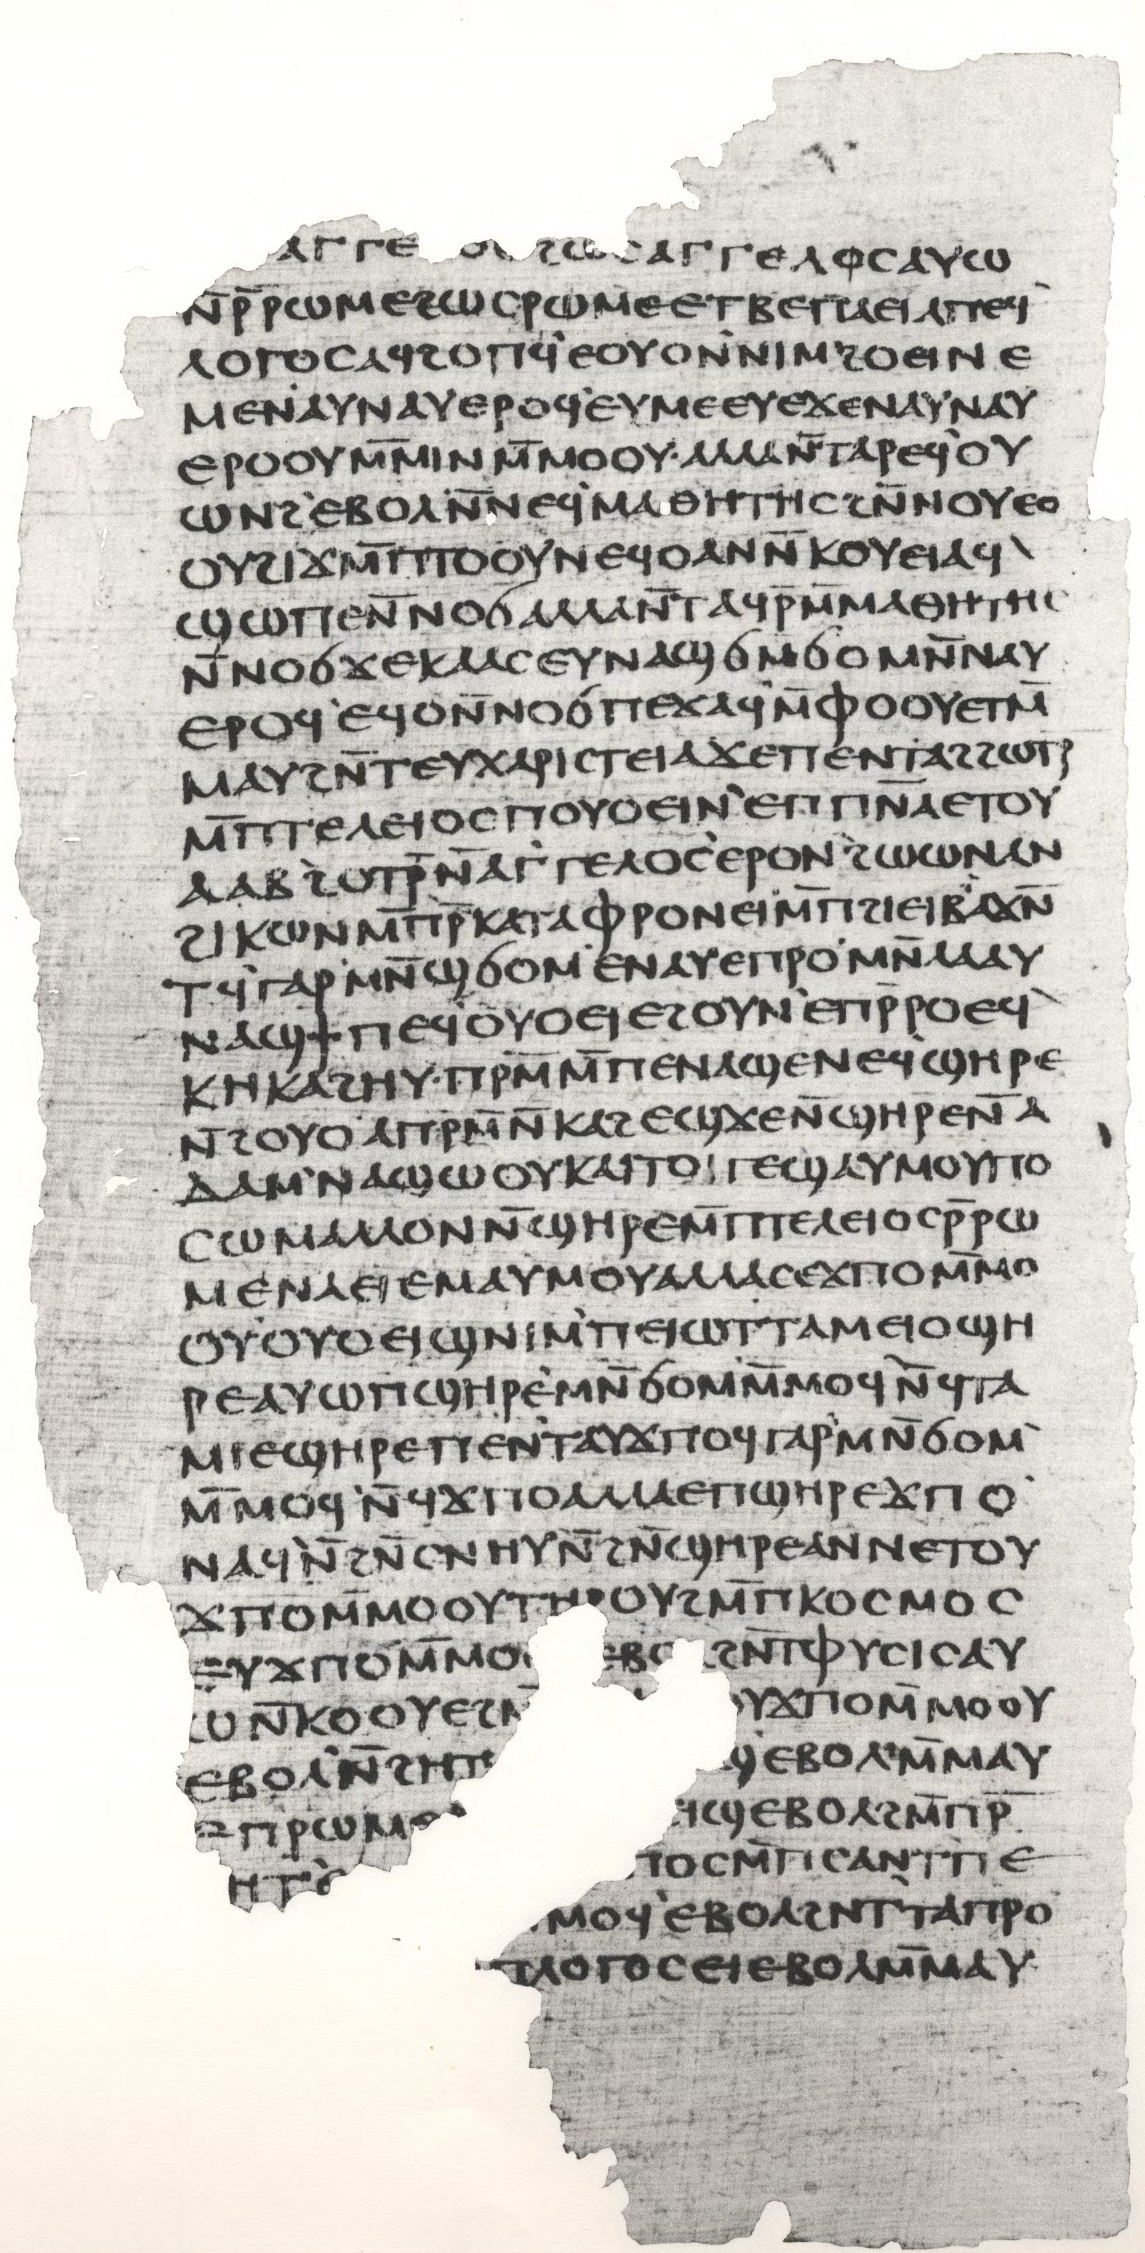 Gospel_of_Philip_facsimile_Page_58.jpg